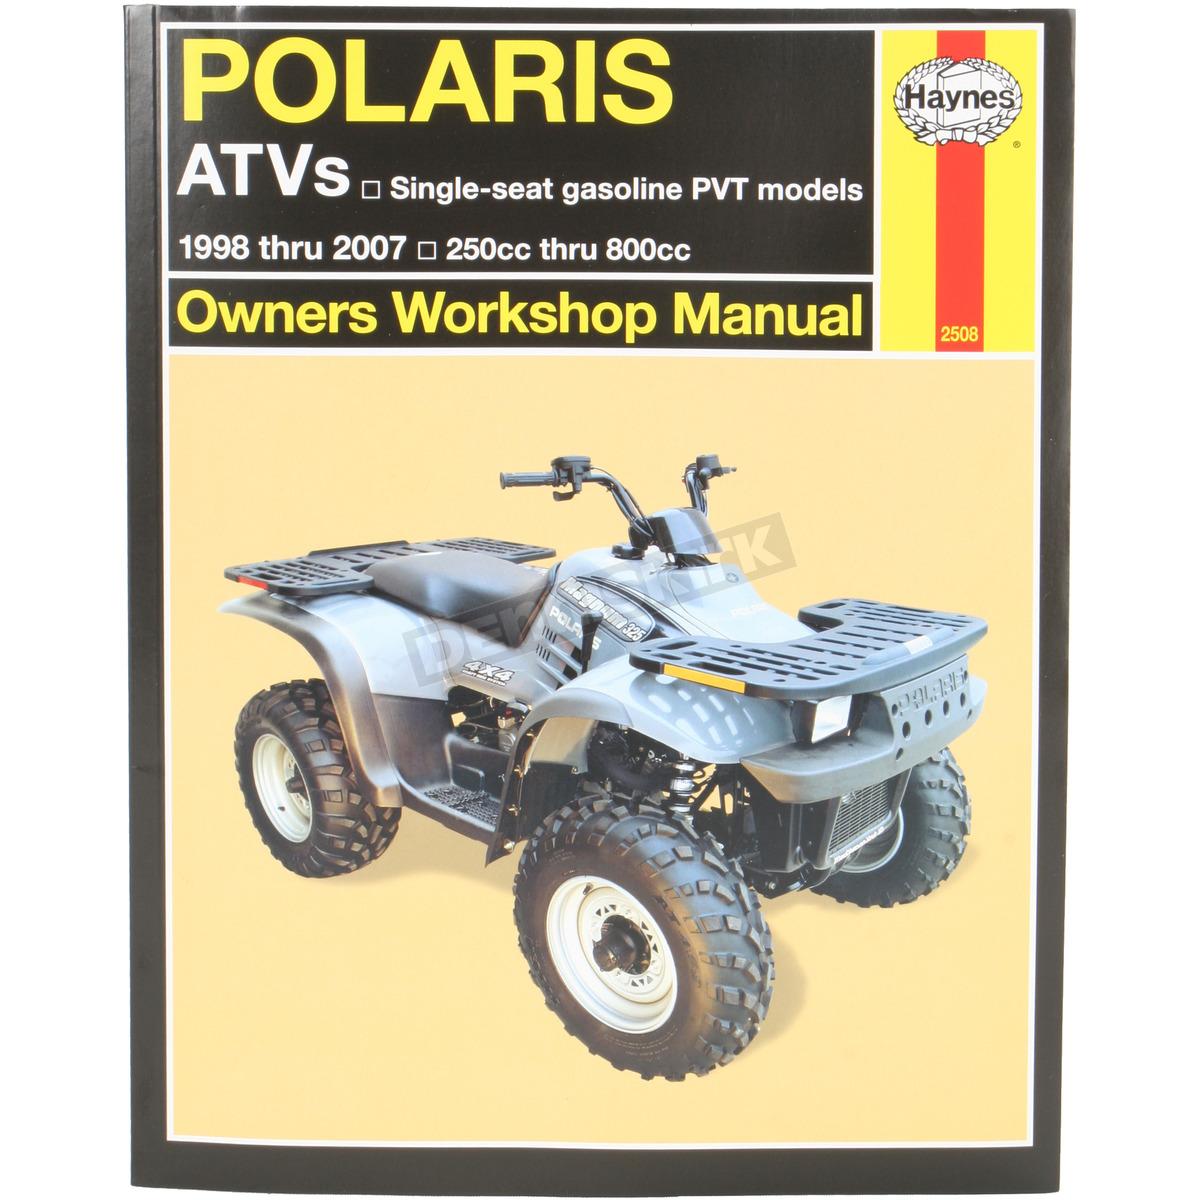 1999 polaris scrambler 400 owners manual viewmotorjdi org rh viewmotorjdi org polaris magnum 425 manual pdf polaris magnum 500 owners manual